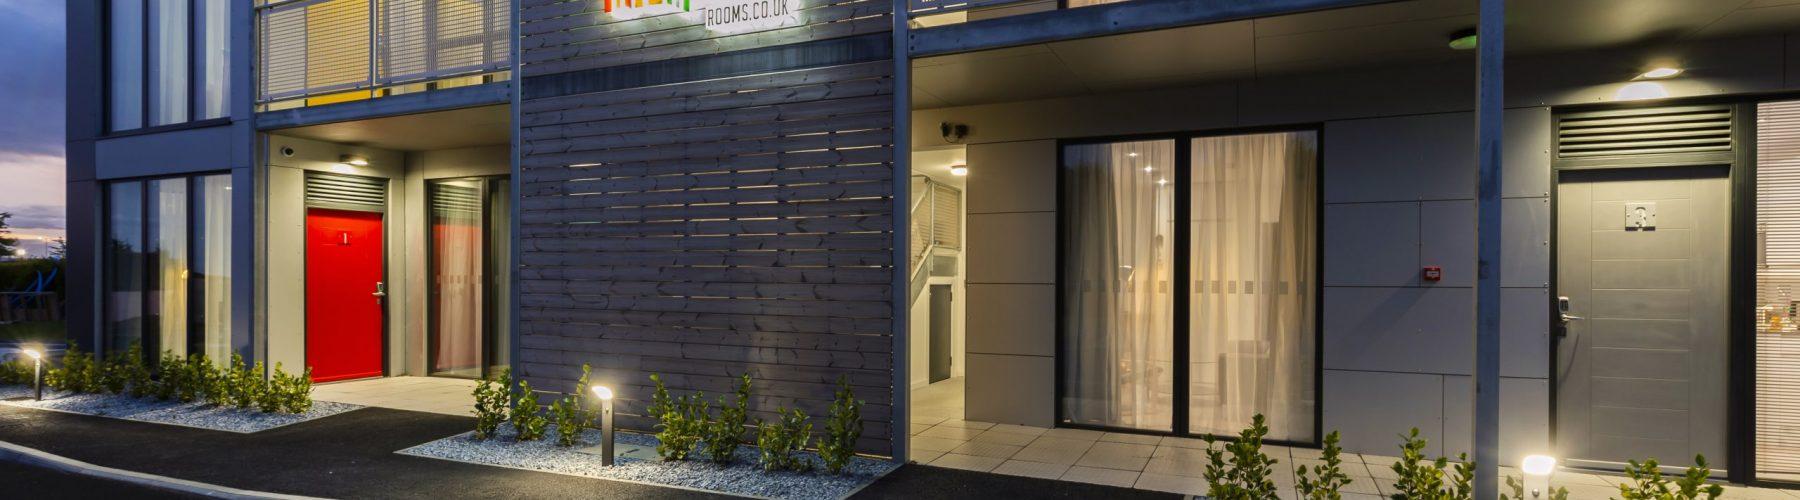 Apartrooms at night_17